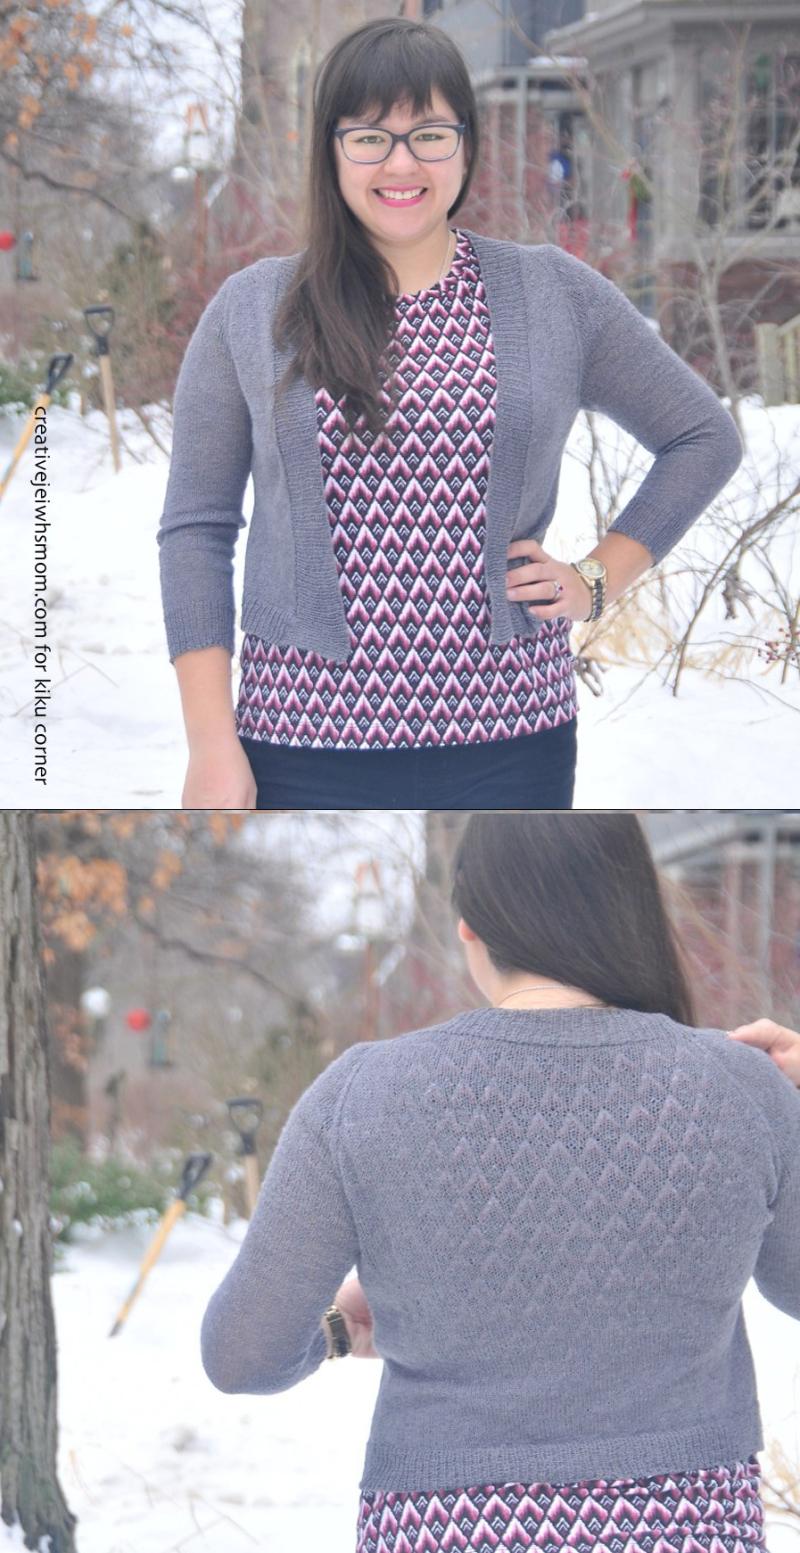 Knit diamond pattern cardigan